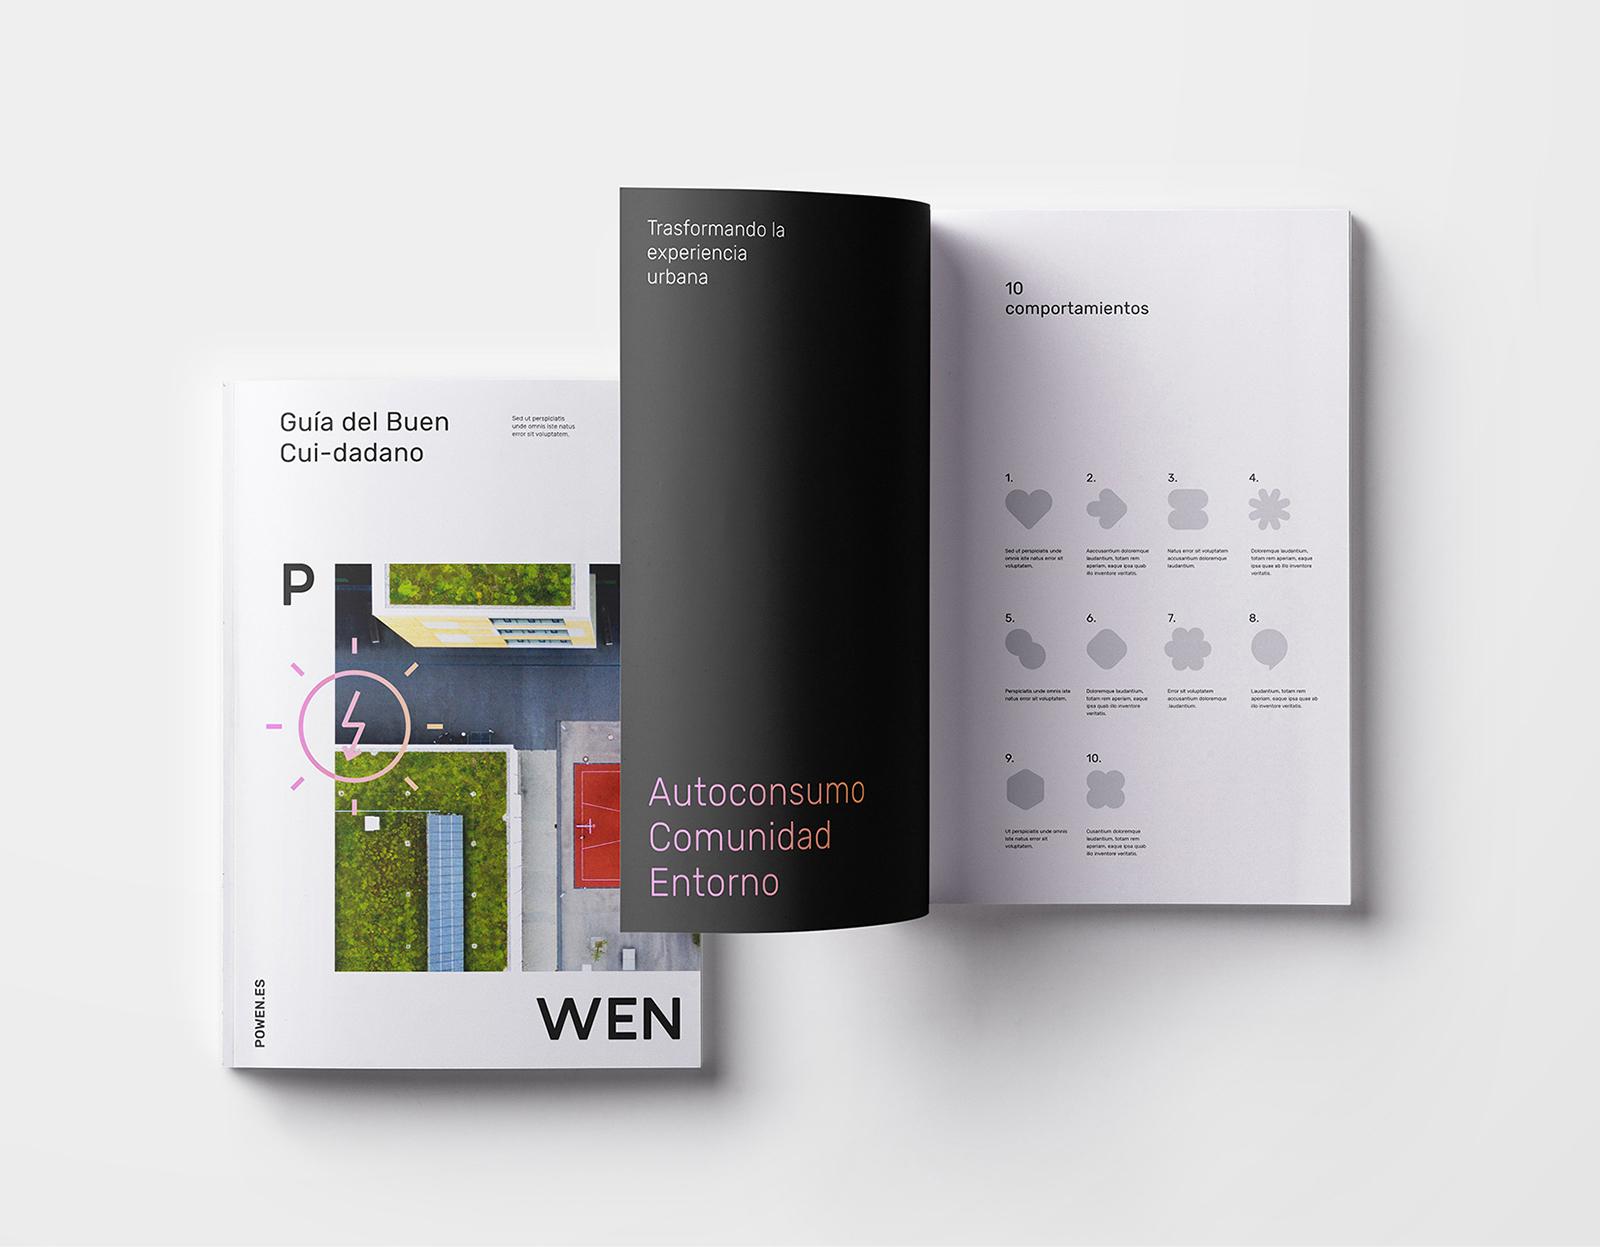 POWEN品牌全新視覺VI形象設計欣賞-VI設計7